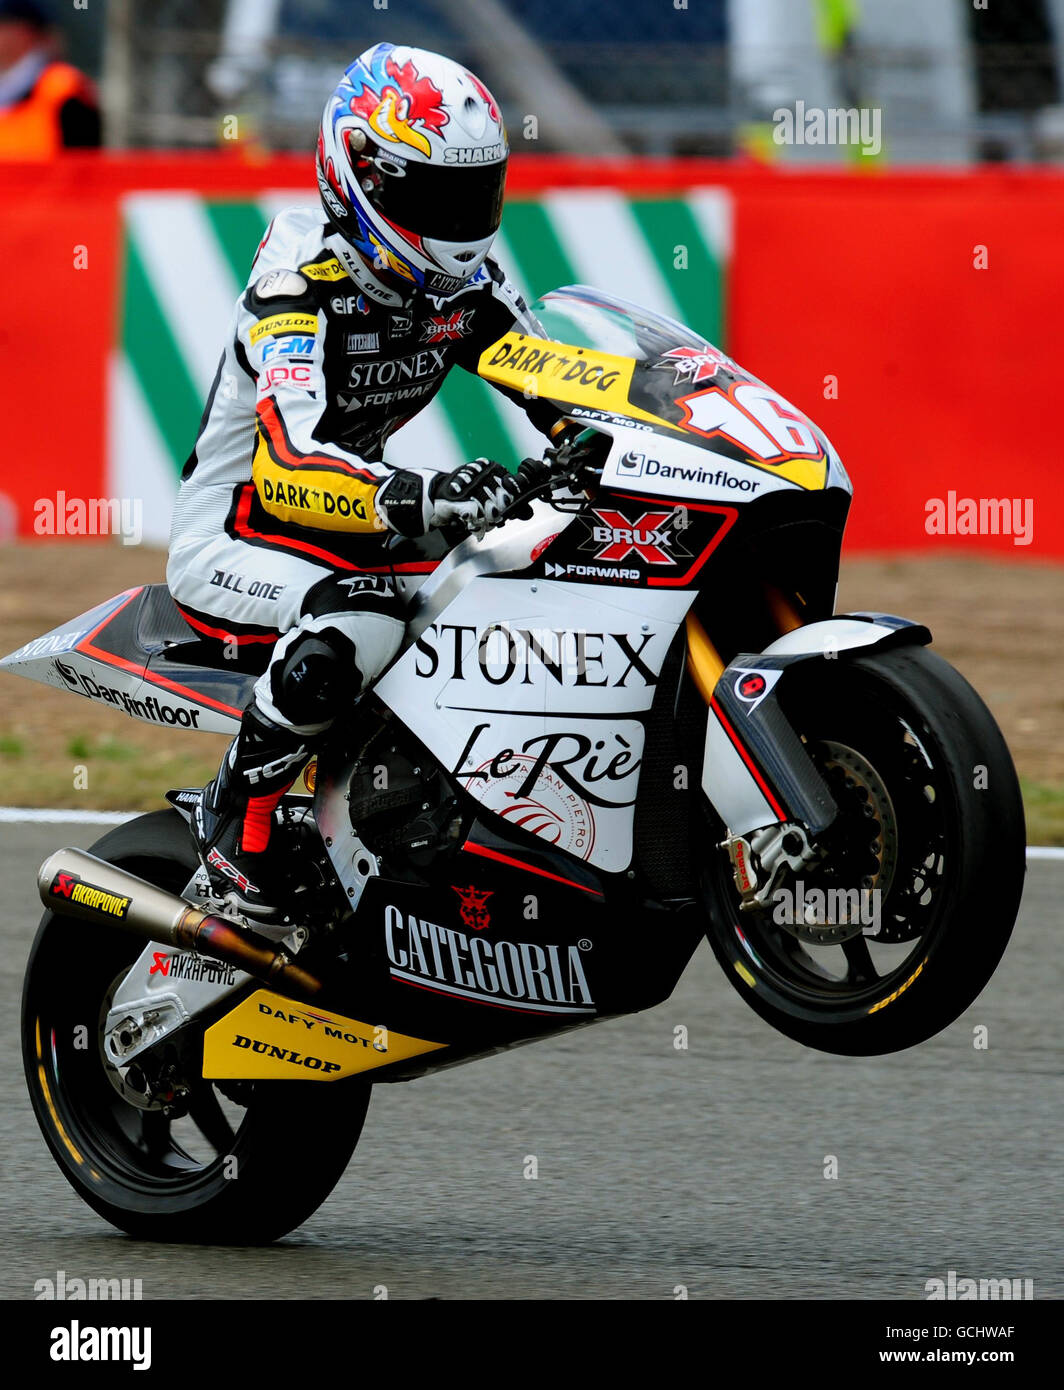 Motor Cycling - 2010 AirAsia British Grand Prix - Moto2 Championship - Silverstone - Stock Image